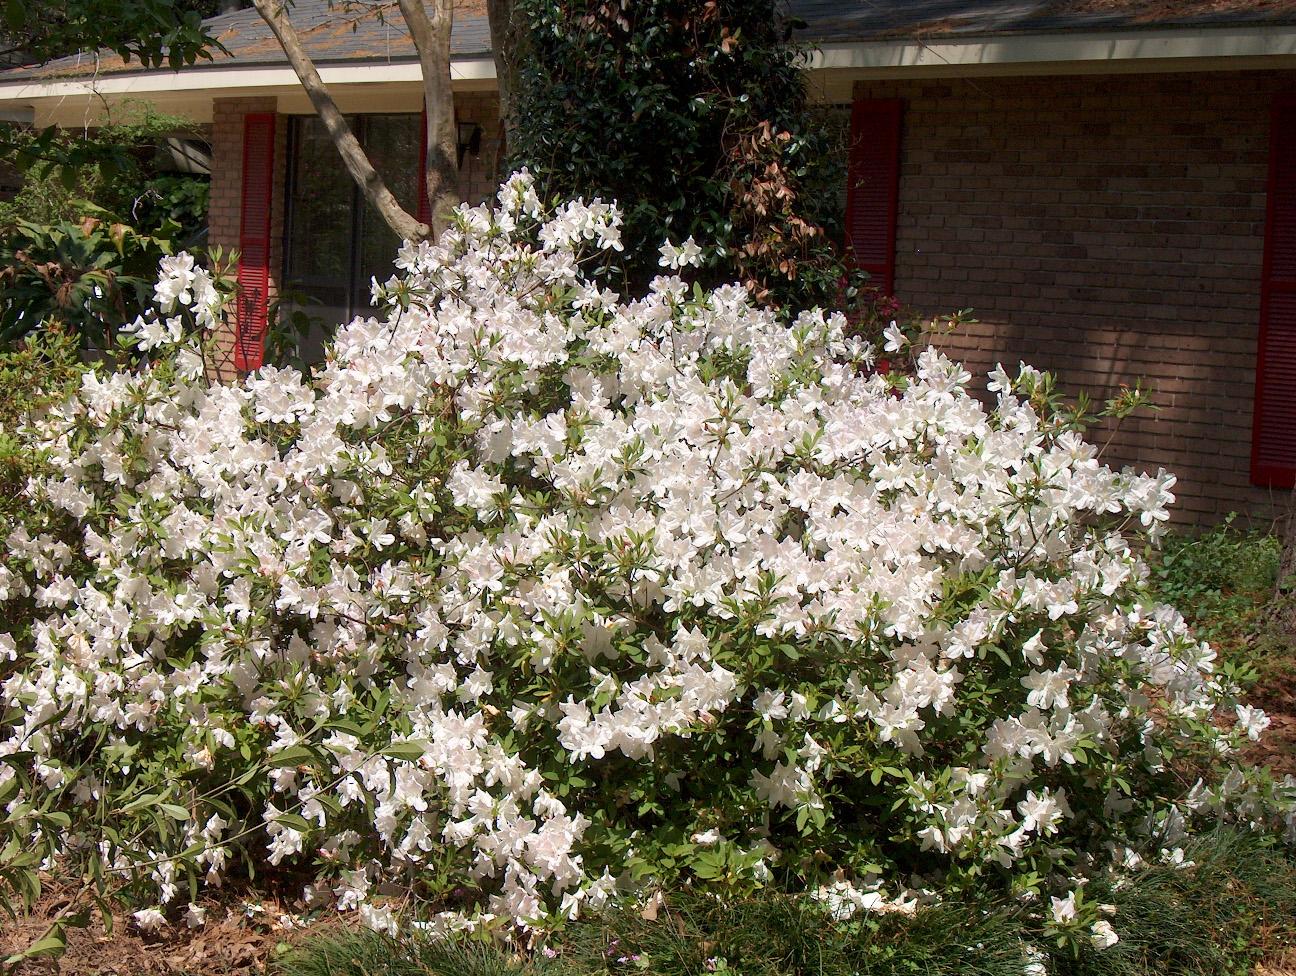 Rhododendron indicum 'Mrs. G.G. Gerbing' / Rhododendron indicum 'Mrs. G.G. Gerbing'